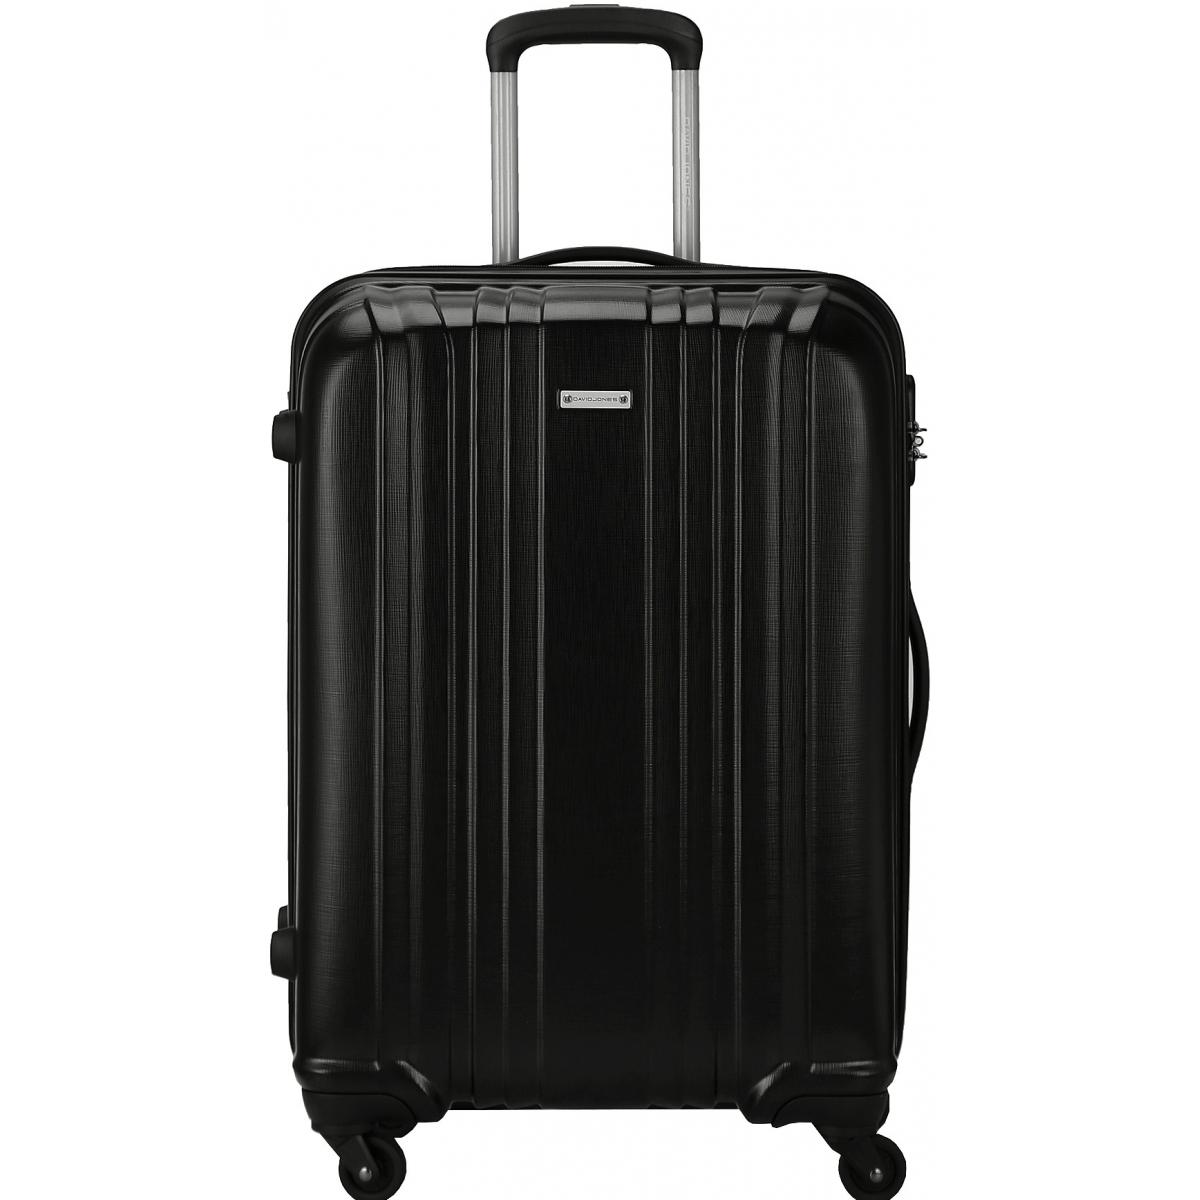 valise rigide david jones taille m 66cm ba10171m couleur principale black solde. Black Bedroom Furniture Sets. Home Design Ideas